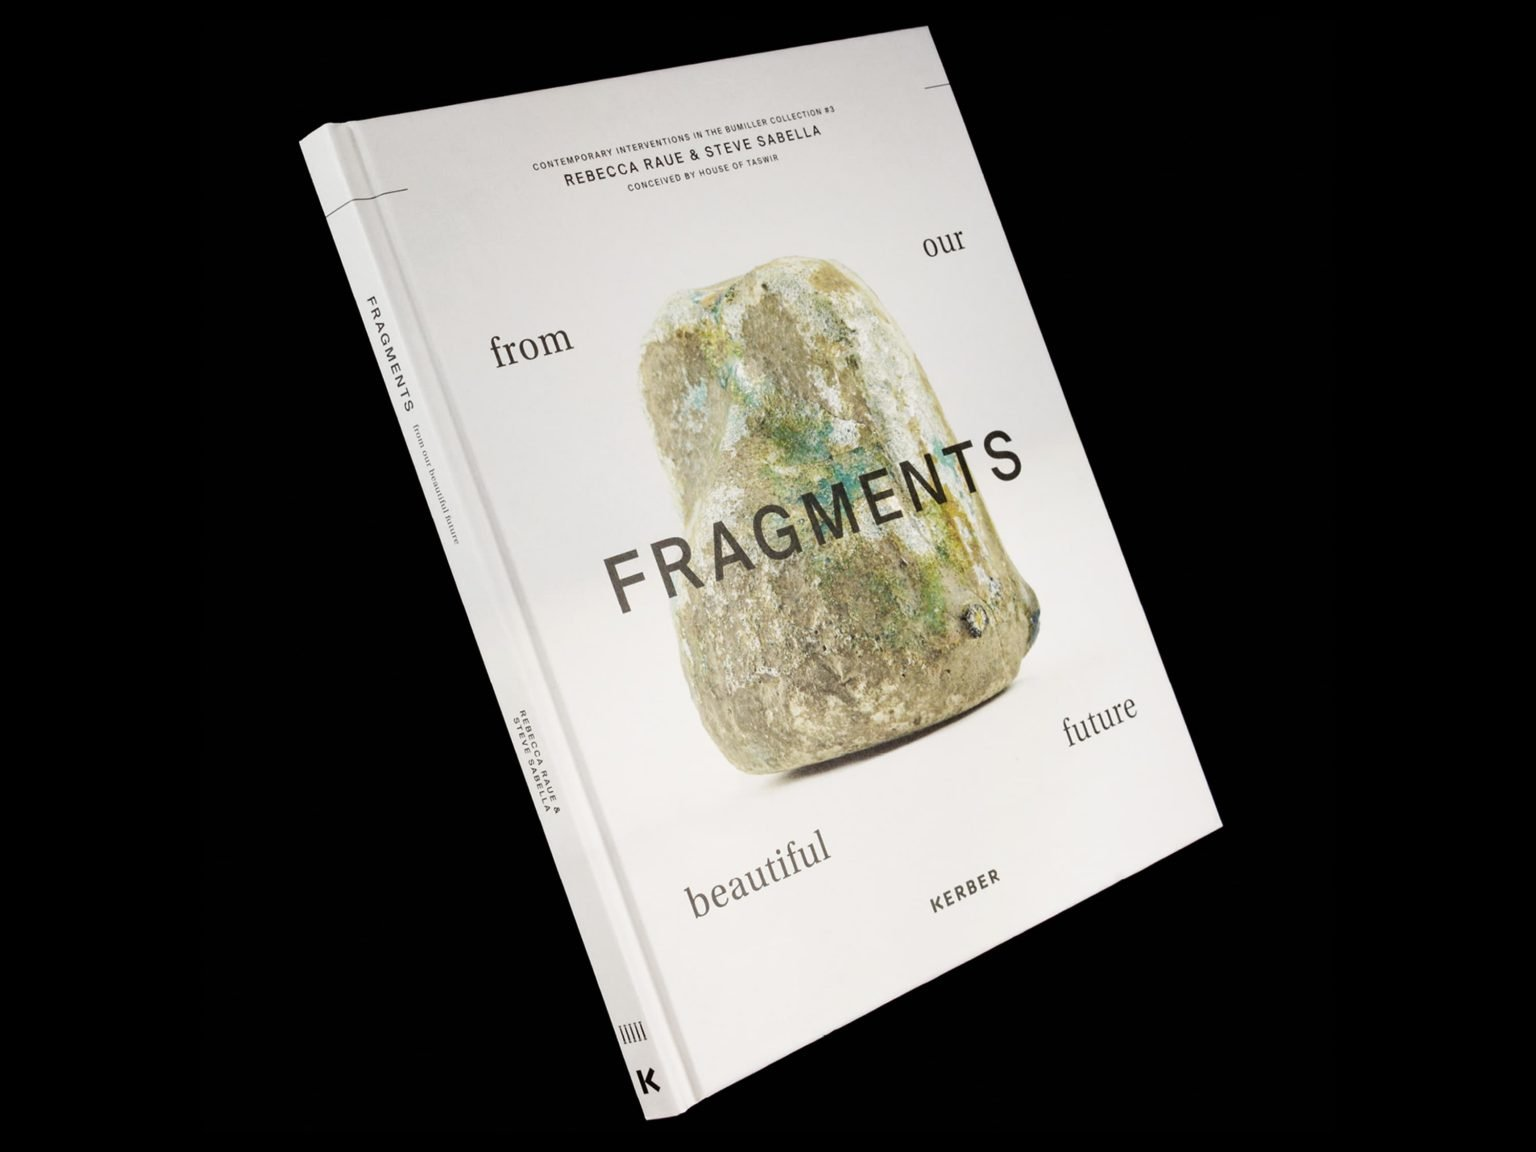 Ta Trung Fragments 01